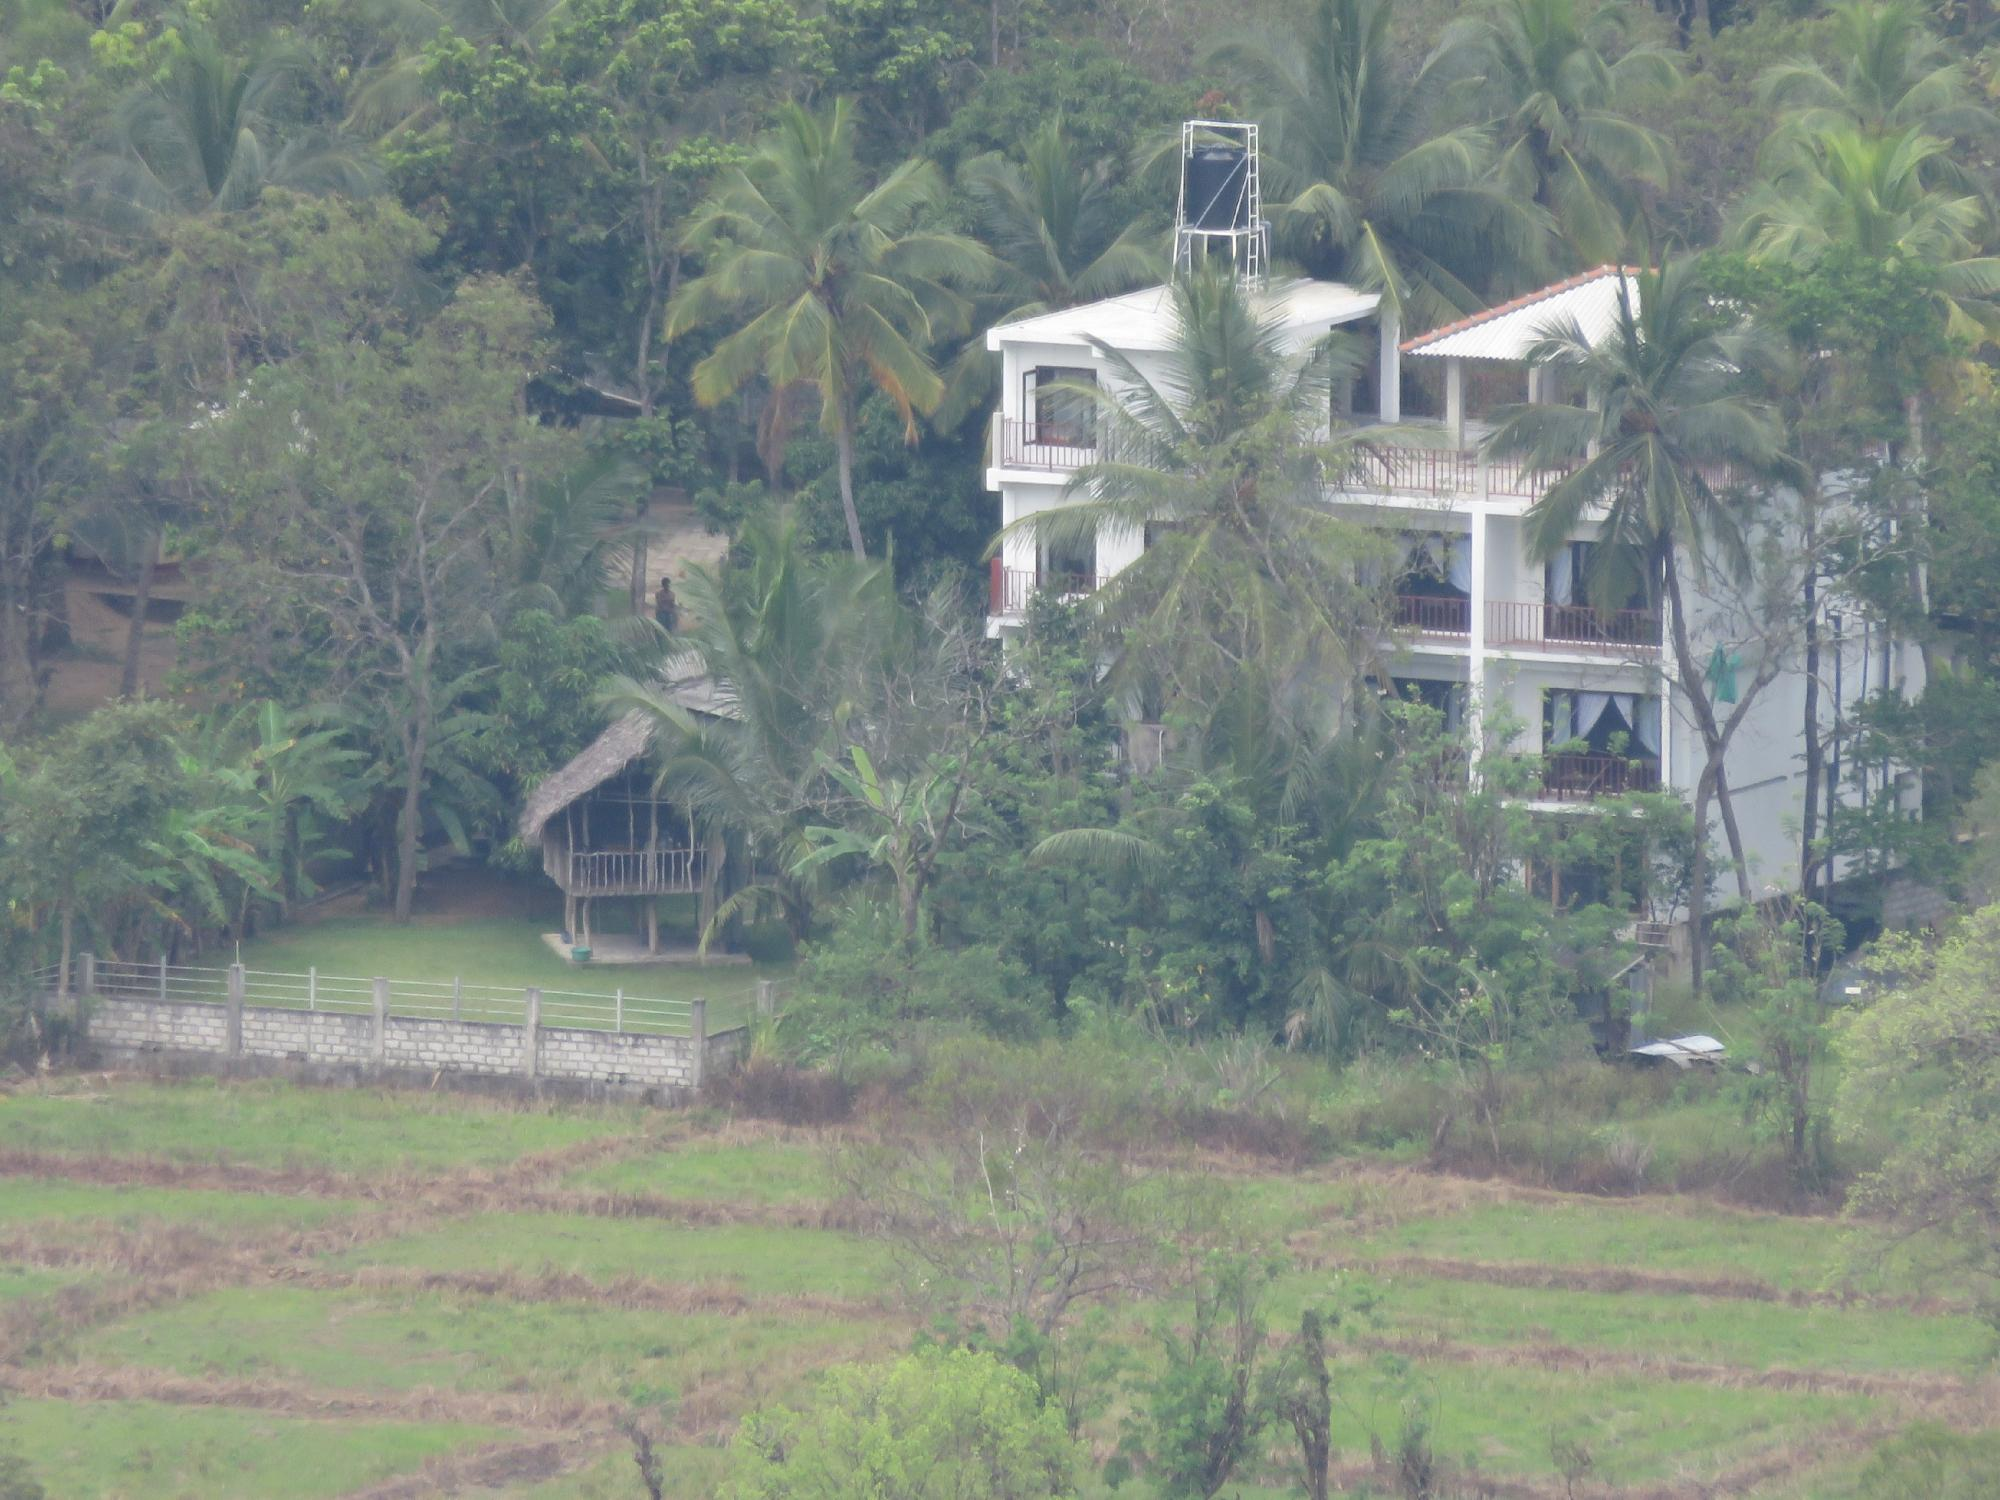 Lakmini Lodge